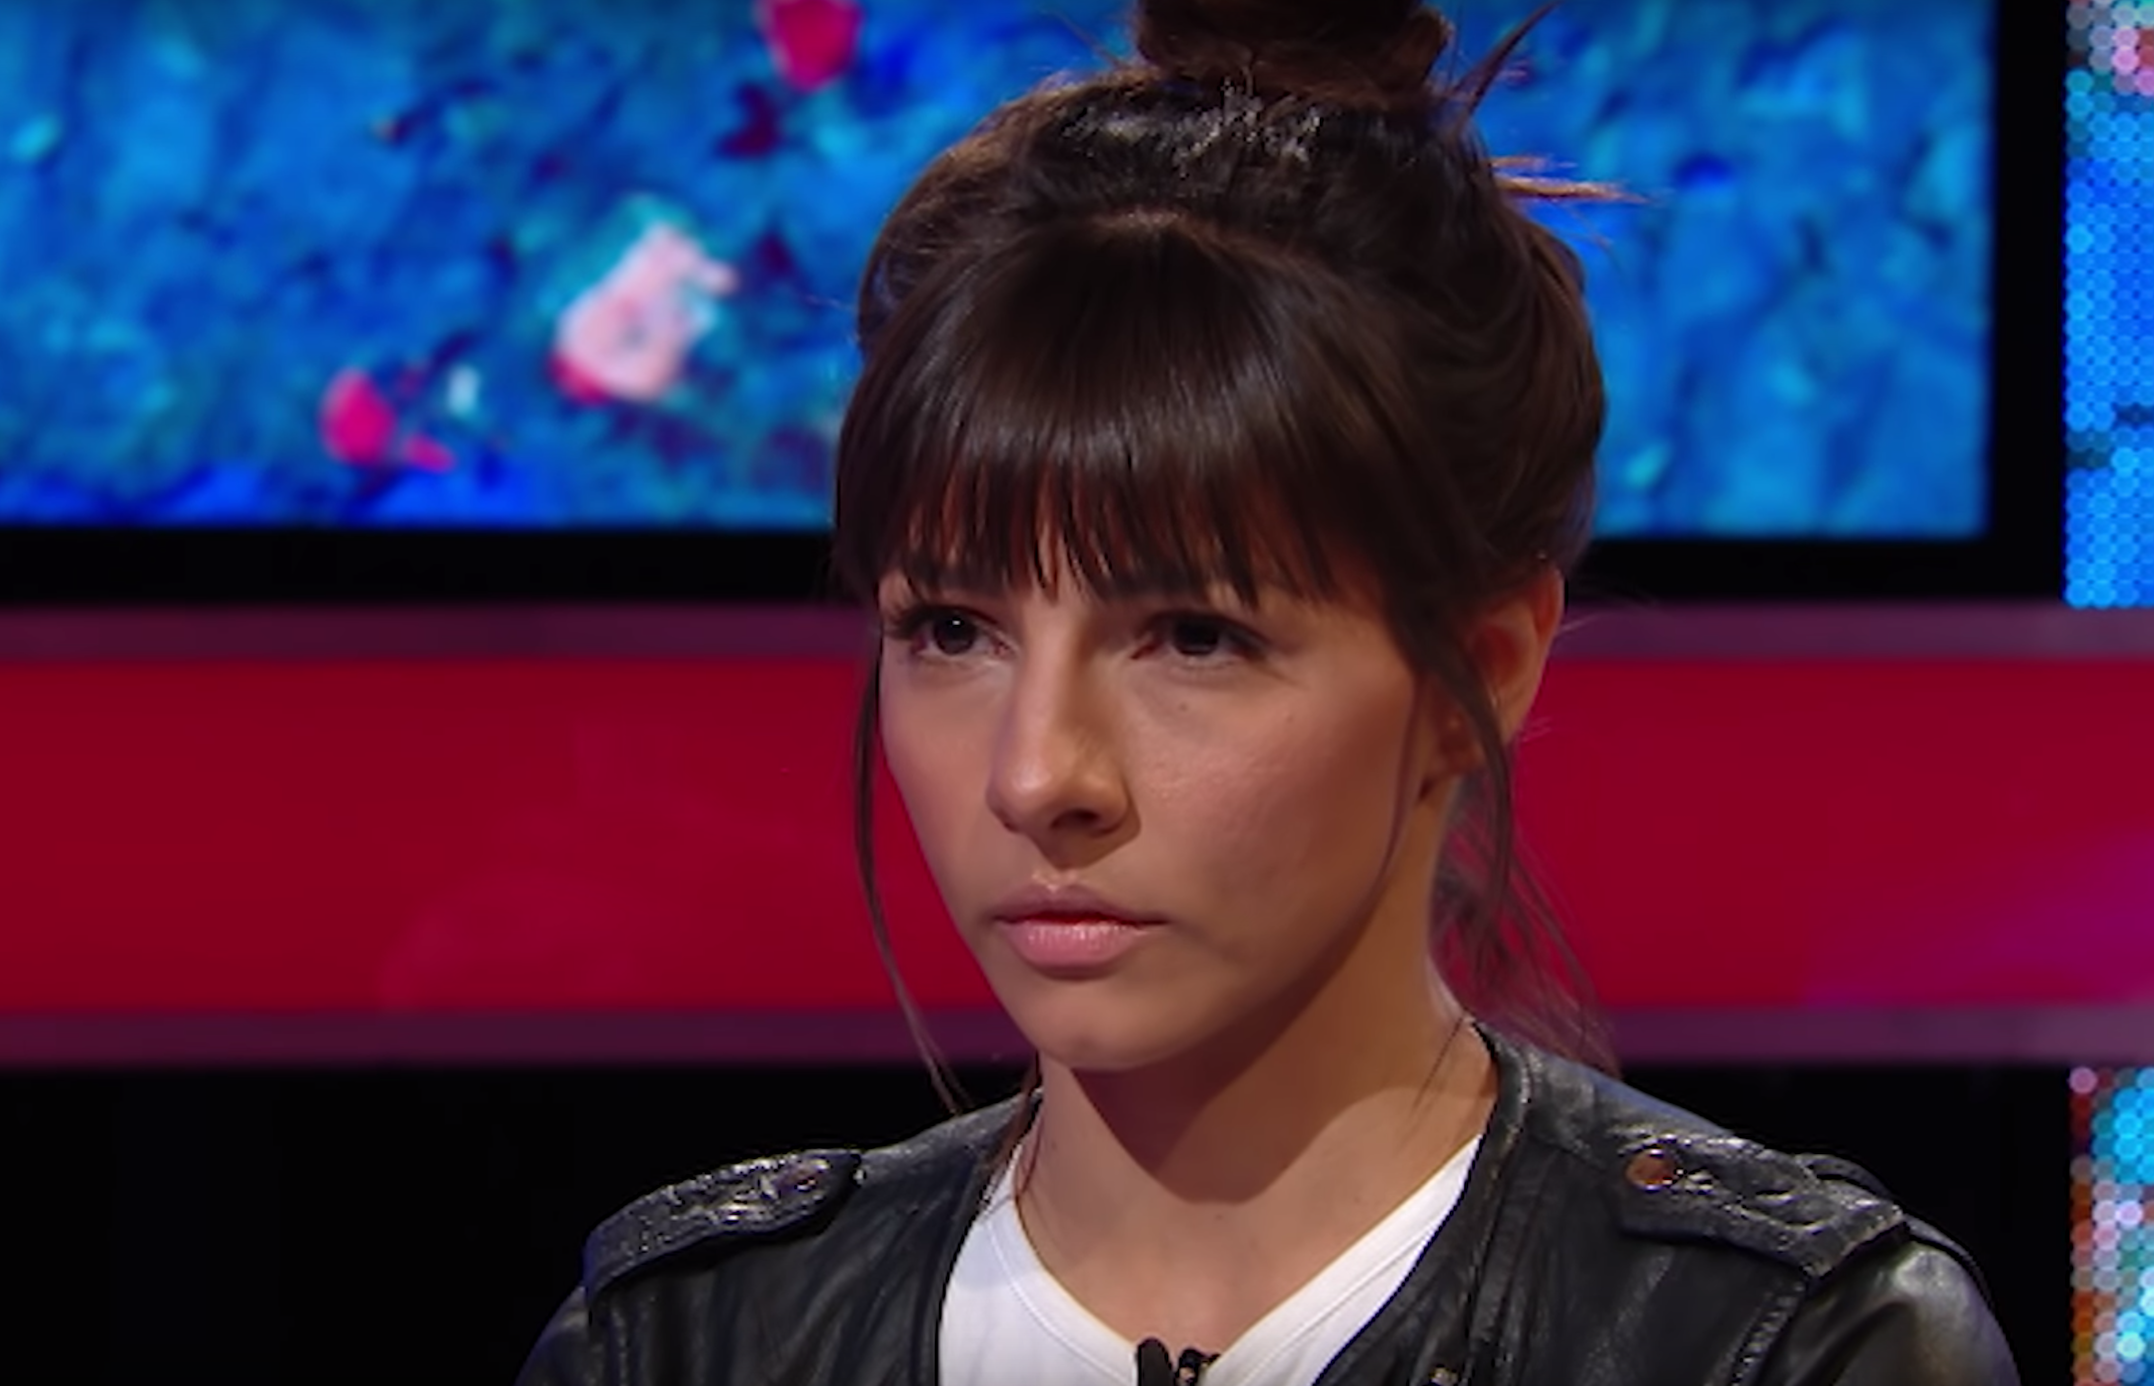 Roxanne Pallett hails Piers Morgan as her 'saviour' as ex CBB star reveals friendship